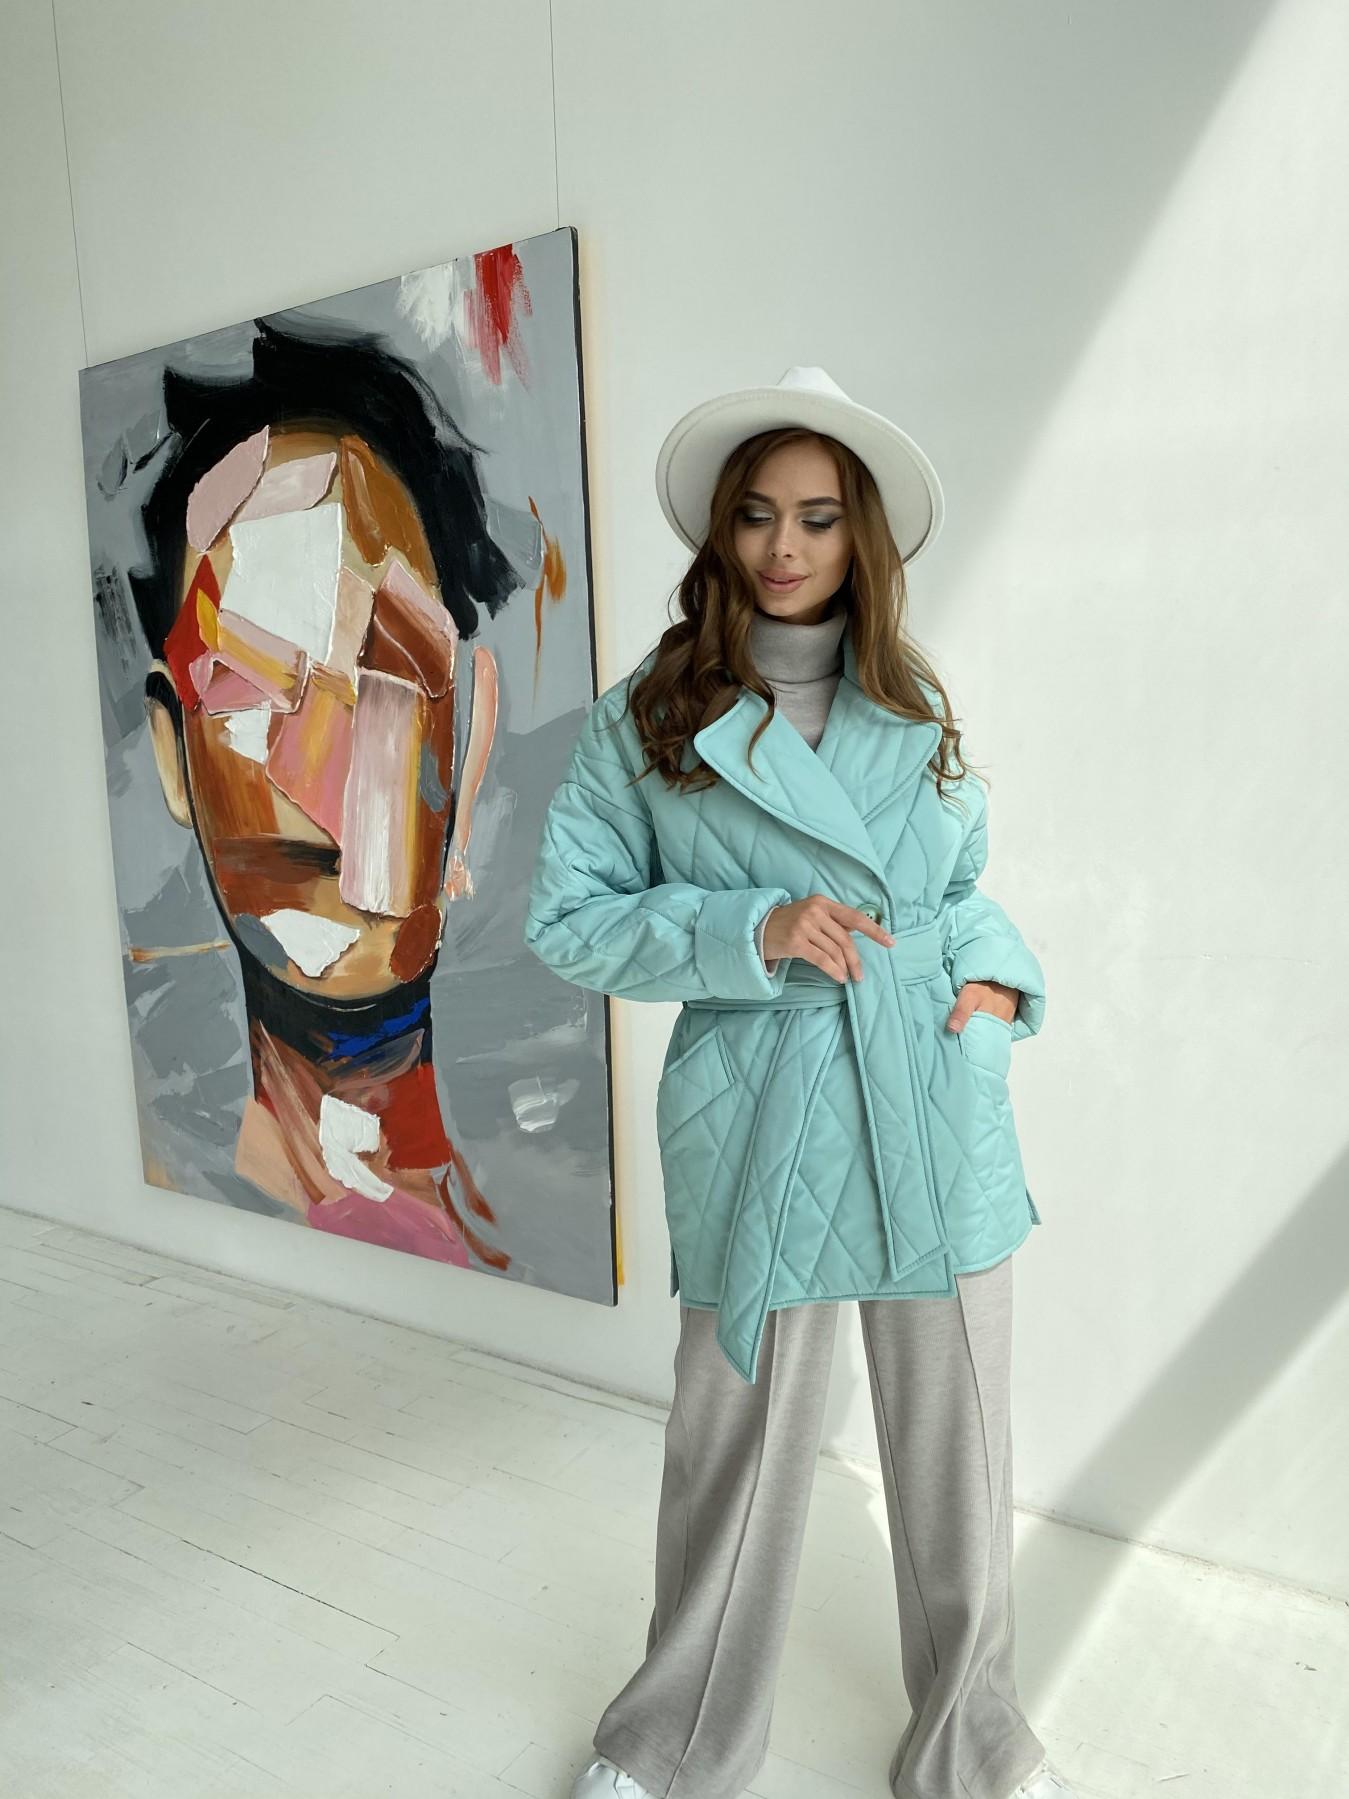 Норд стеганая куртка из плащеки 11770  АРТ. 48511 Цвет: Олива 2 - фото 6, интернет магазин tm-modus.ru